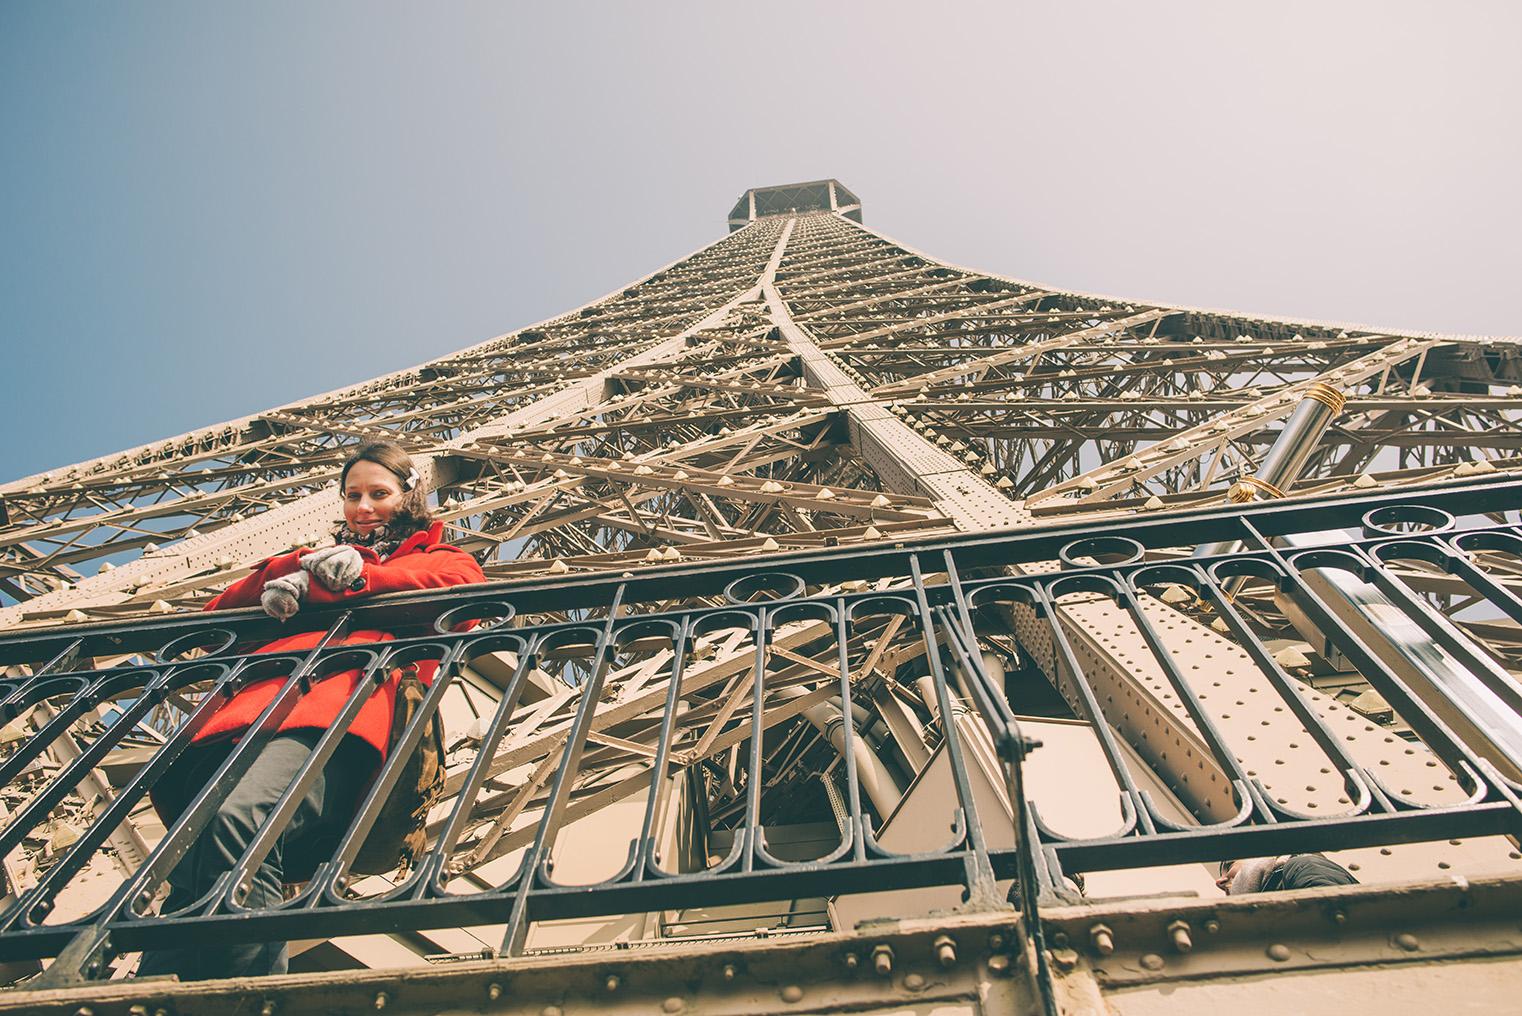 Nad dachami Paryża